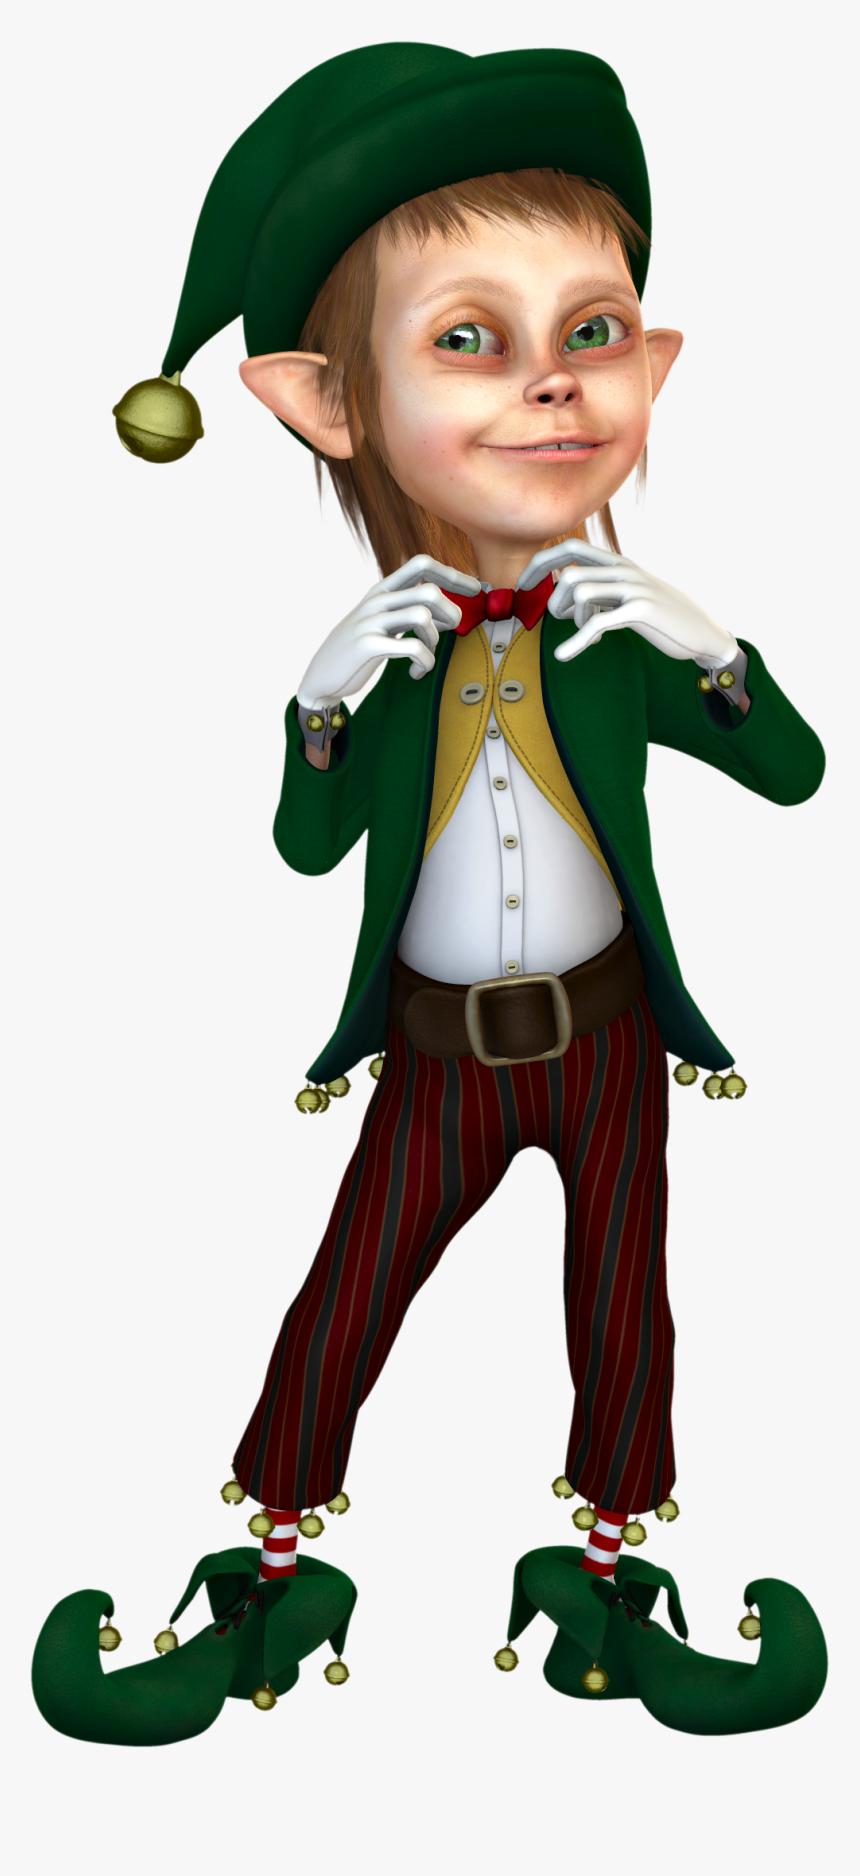 Christmas Elf Transparent Background Png - Christmas Elf 3d Png, Png Download, Free Download